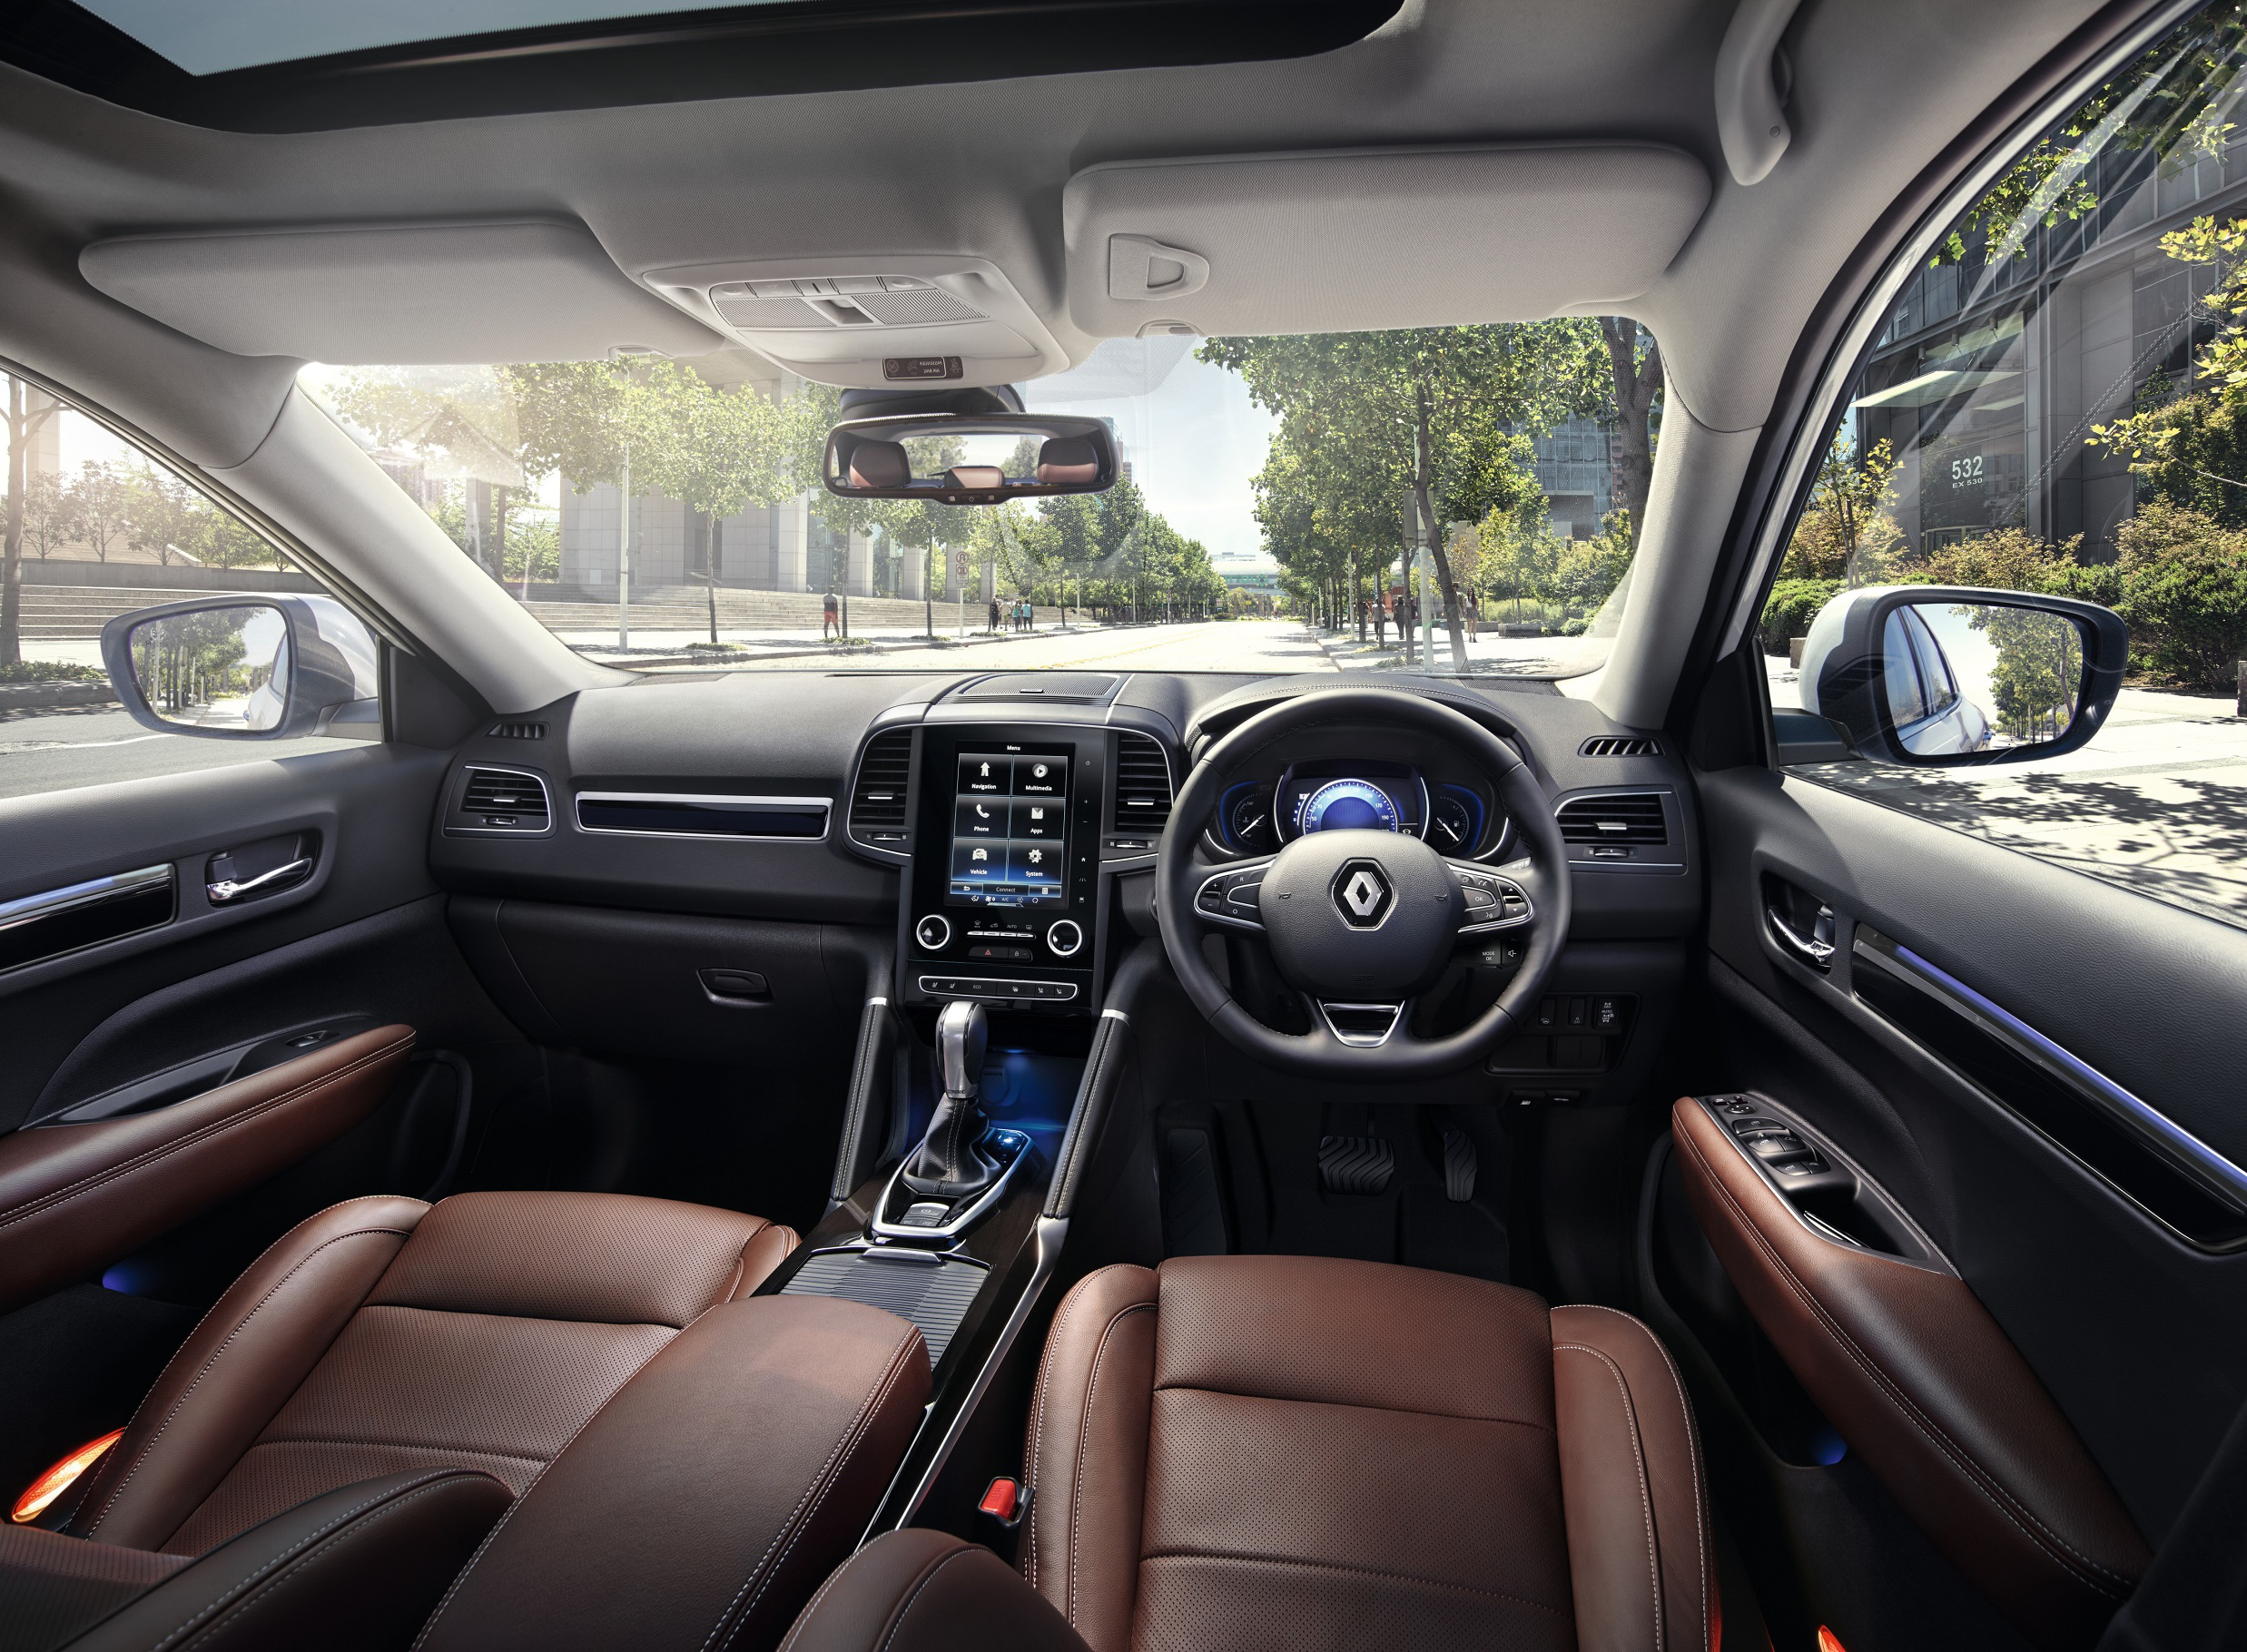 Renault Koleos 2019 >> Renault Koleos Signature,新等级更多配备,售19.88万 2018 Renault Koleos Signature 2WD - Interior - Paul Tan ...